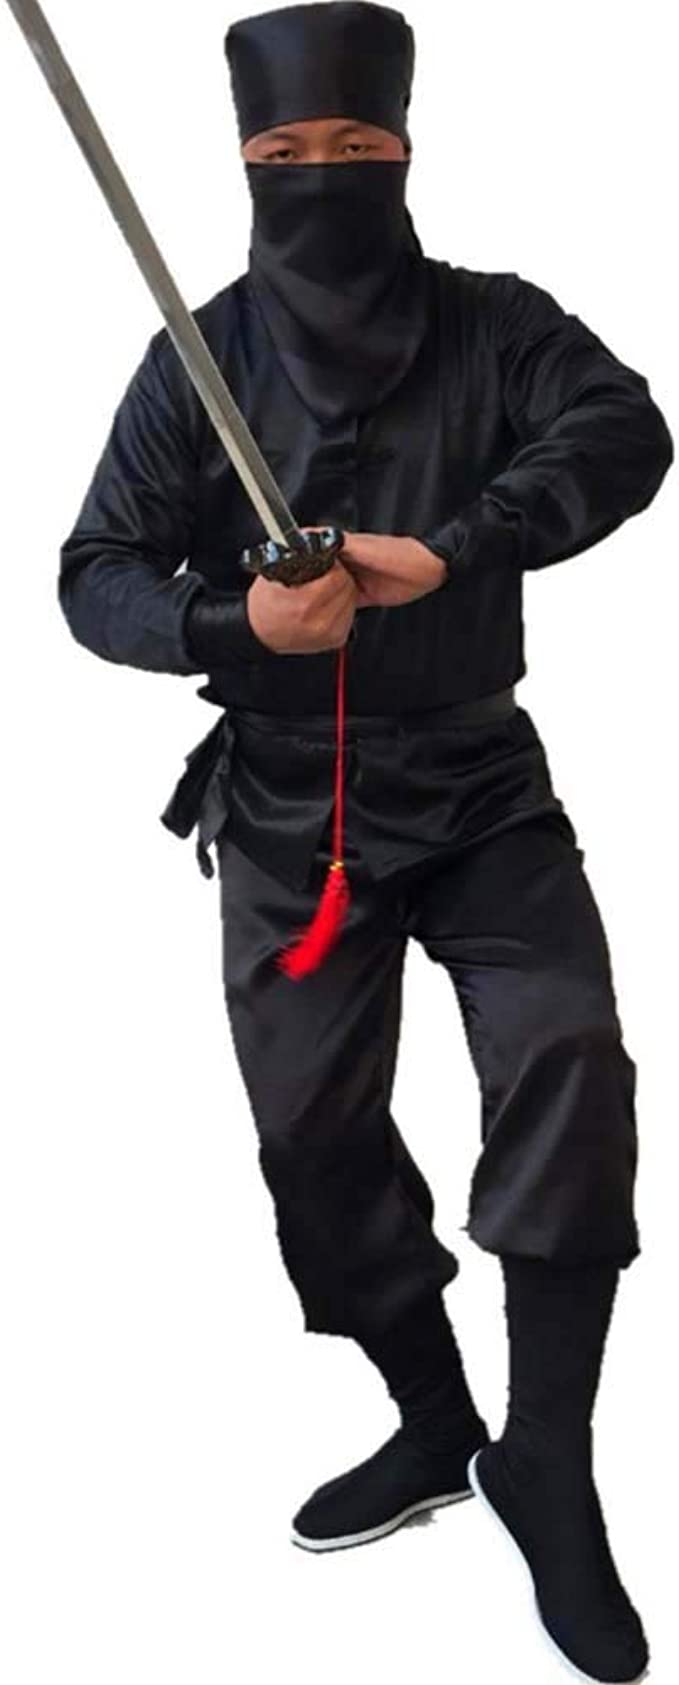 Stealth Ninja Costume Unisex Traditional Chinese Tang Suit Kung Fu Uniform Masked Samura Warrior Fancy Dress